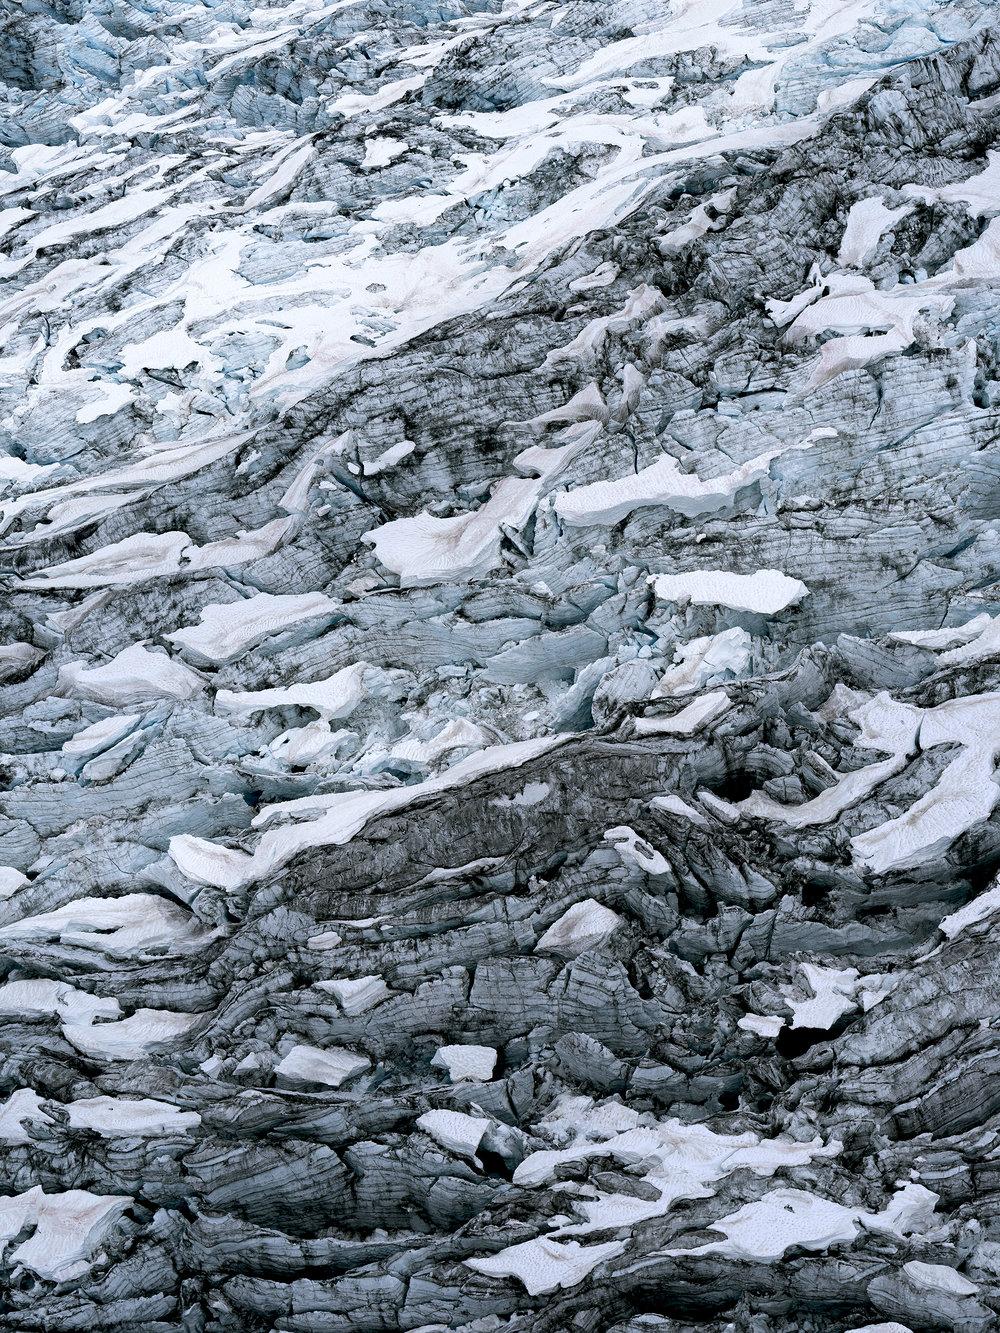 Icefield Study #12   Seafoam on Choppy Water